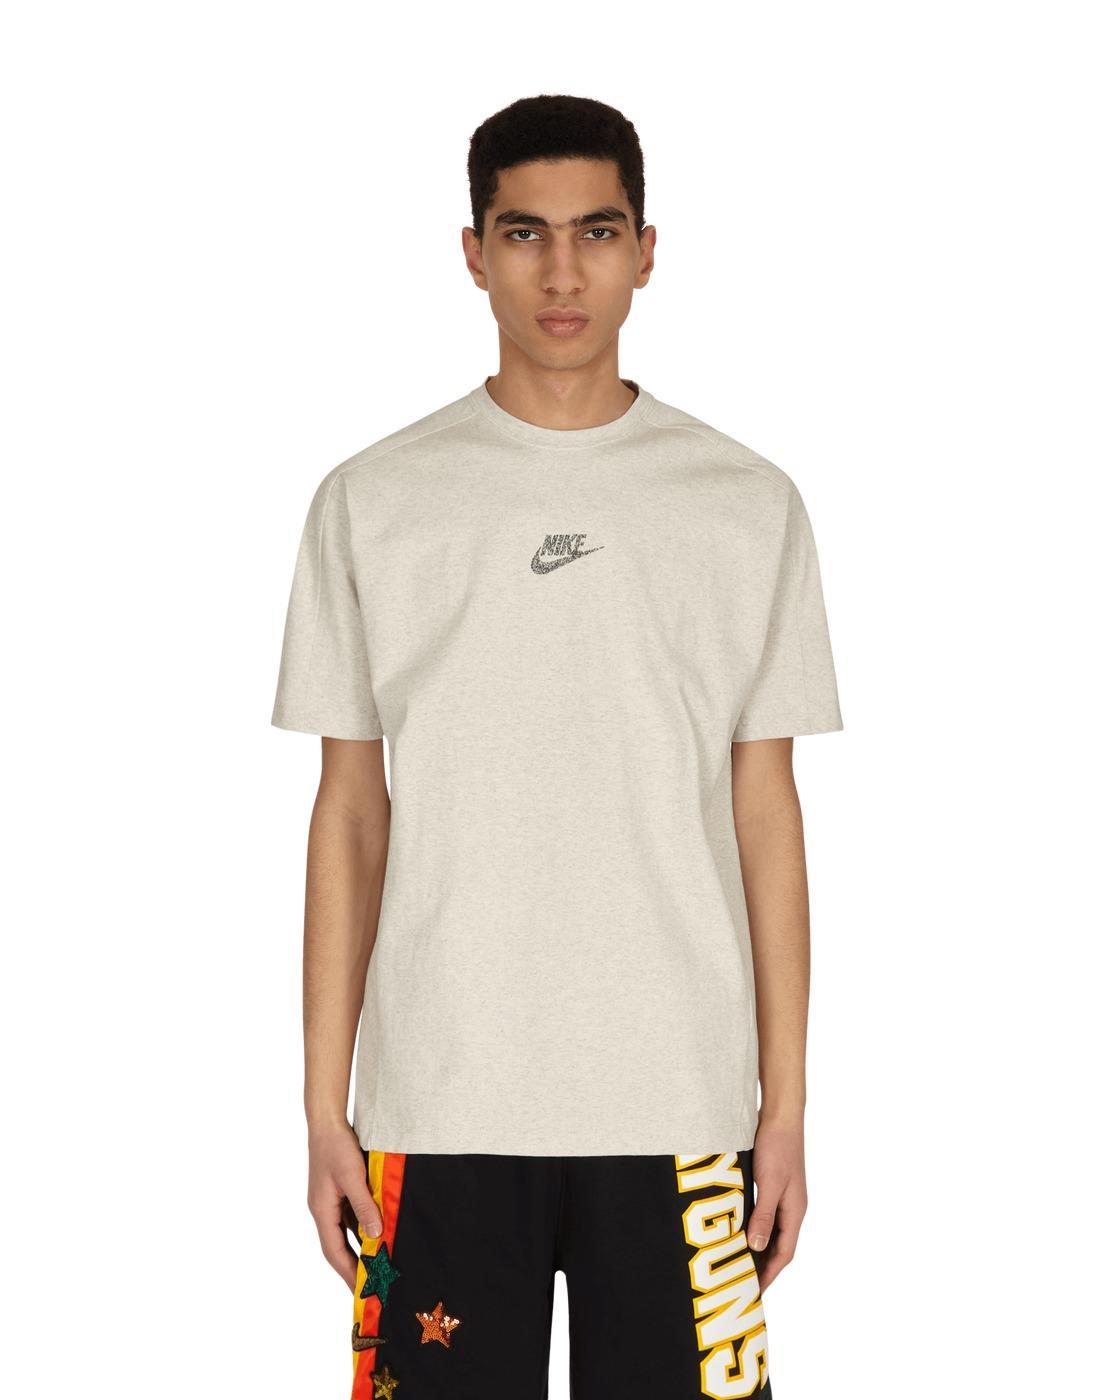 Photo: Nike Logo T Shirt White/Htr